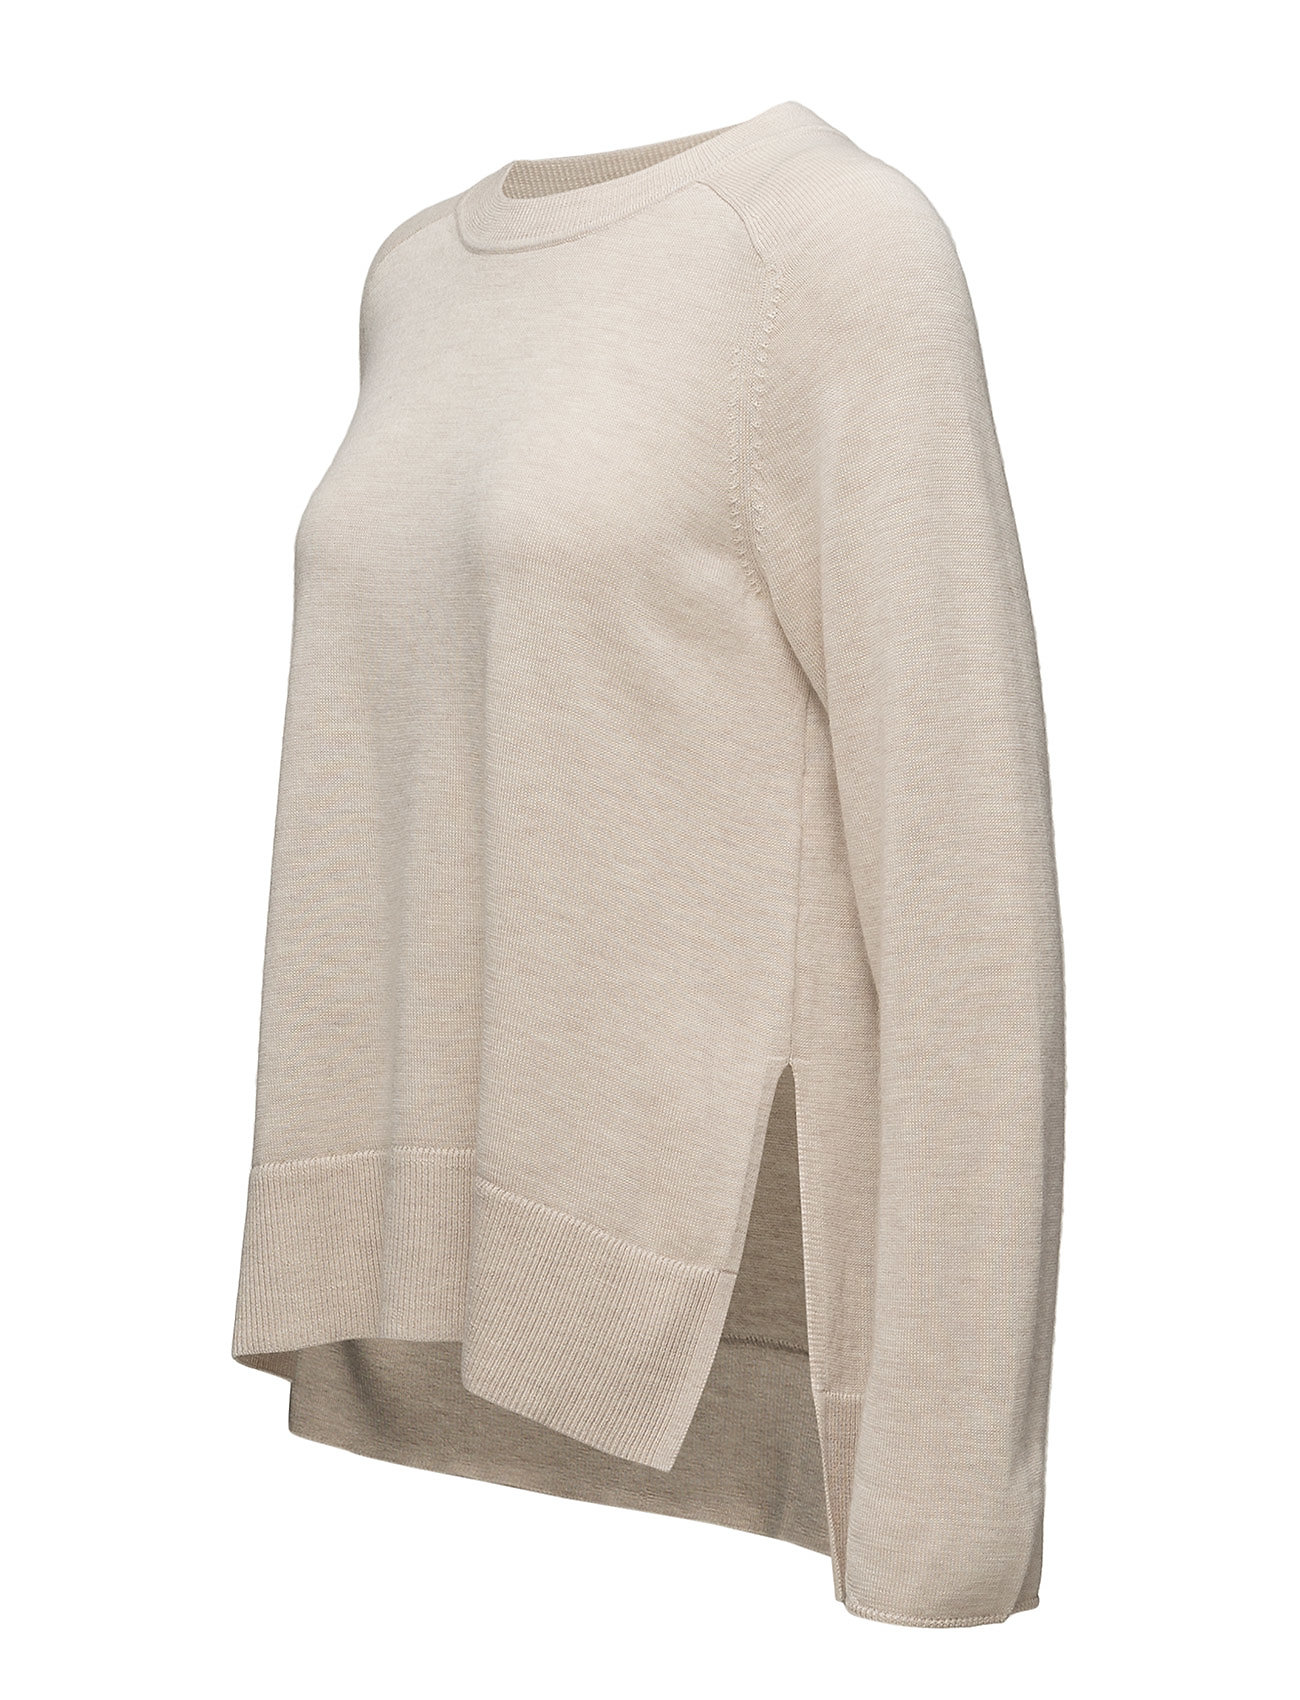 Sweaterbisque Split MelFilippa Cashmere Cashmere Split K Sweaterbisque Sweaterbisque MelFilippa Cashmere K Split D9EIYeW2H